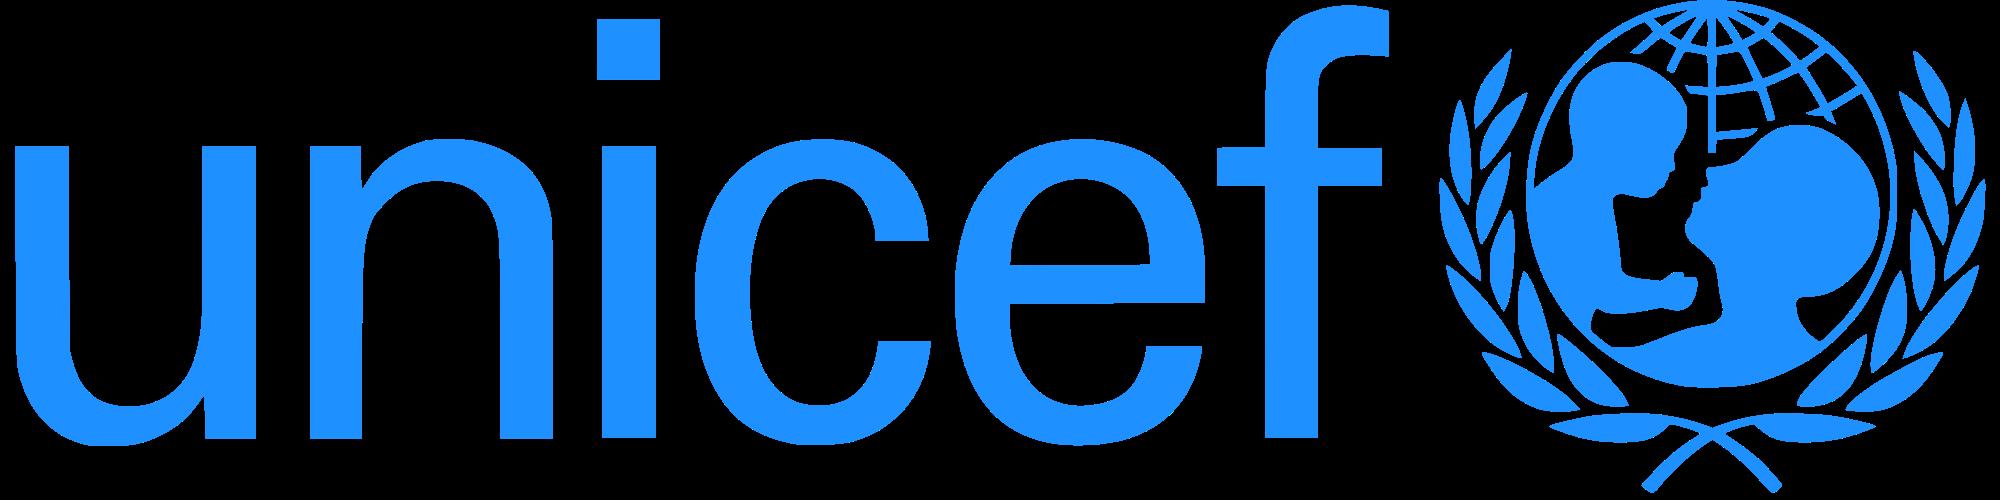 UNICEF-Logo-Wallpaper